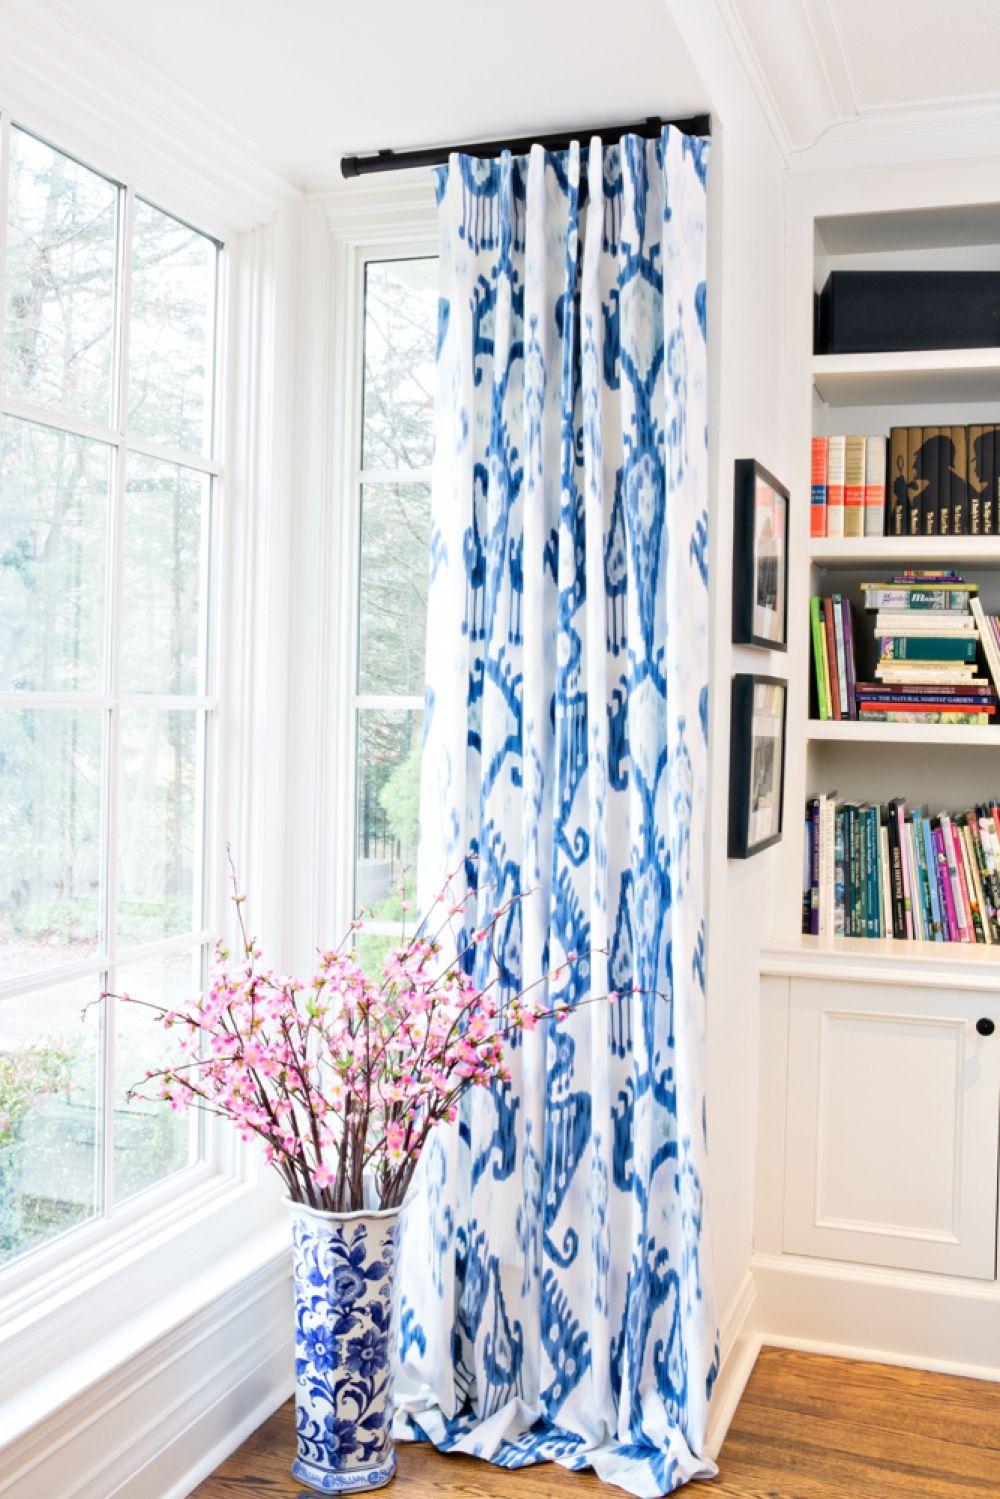 marvelous robert allen home and garden. Robert Allen Khandar Indigo cobistyle drapery curtain panel  blue and white ikat cotton with lining